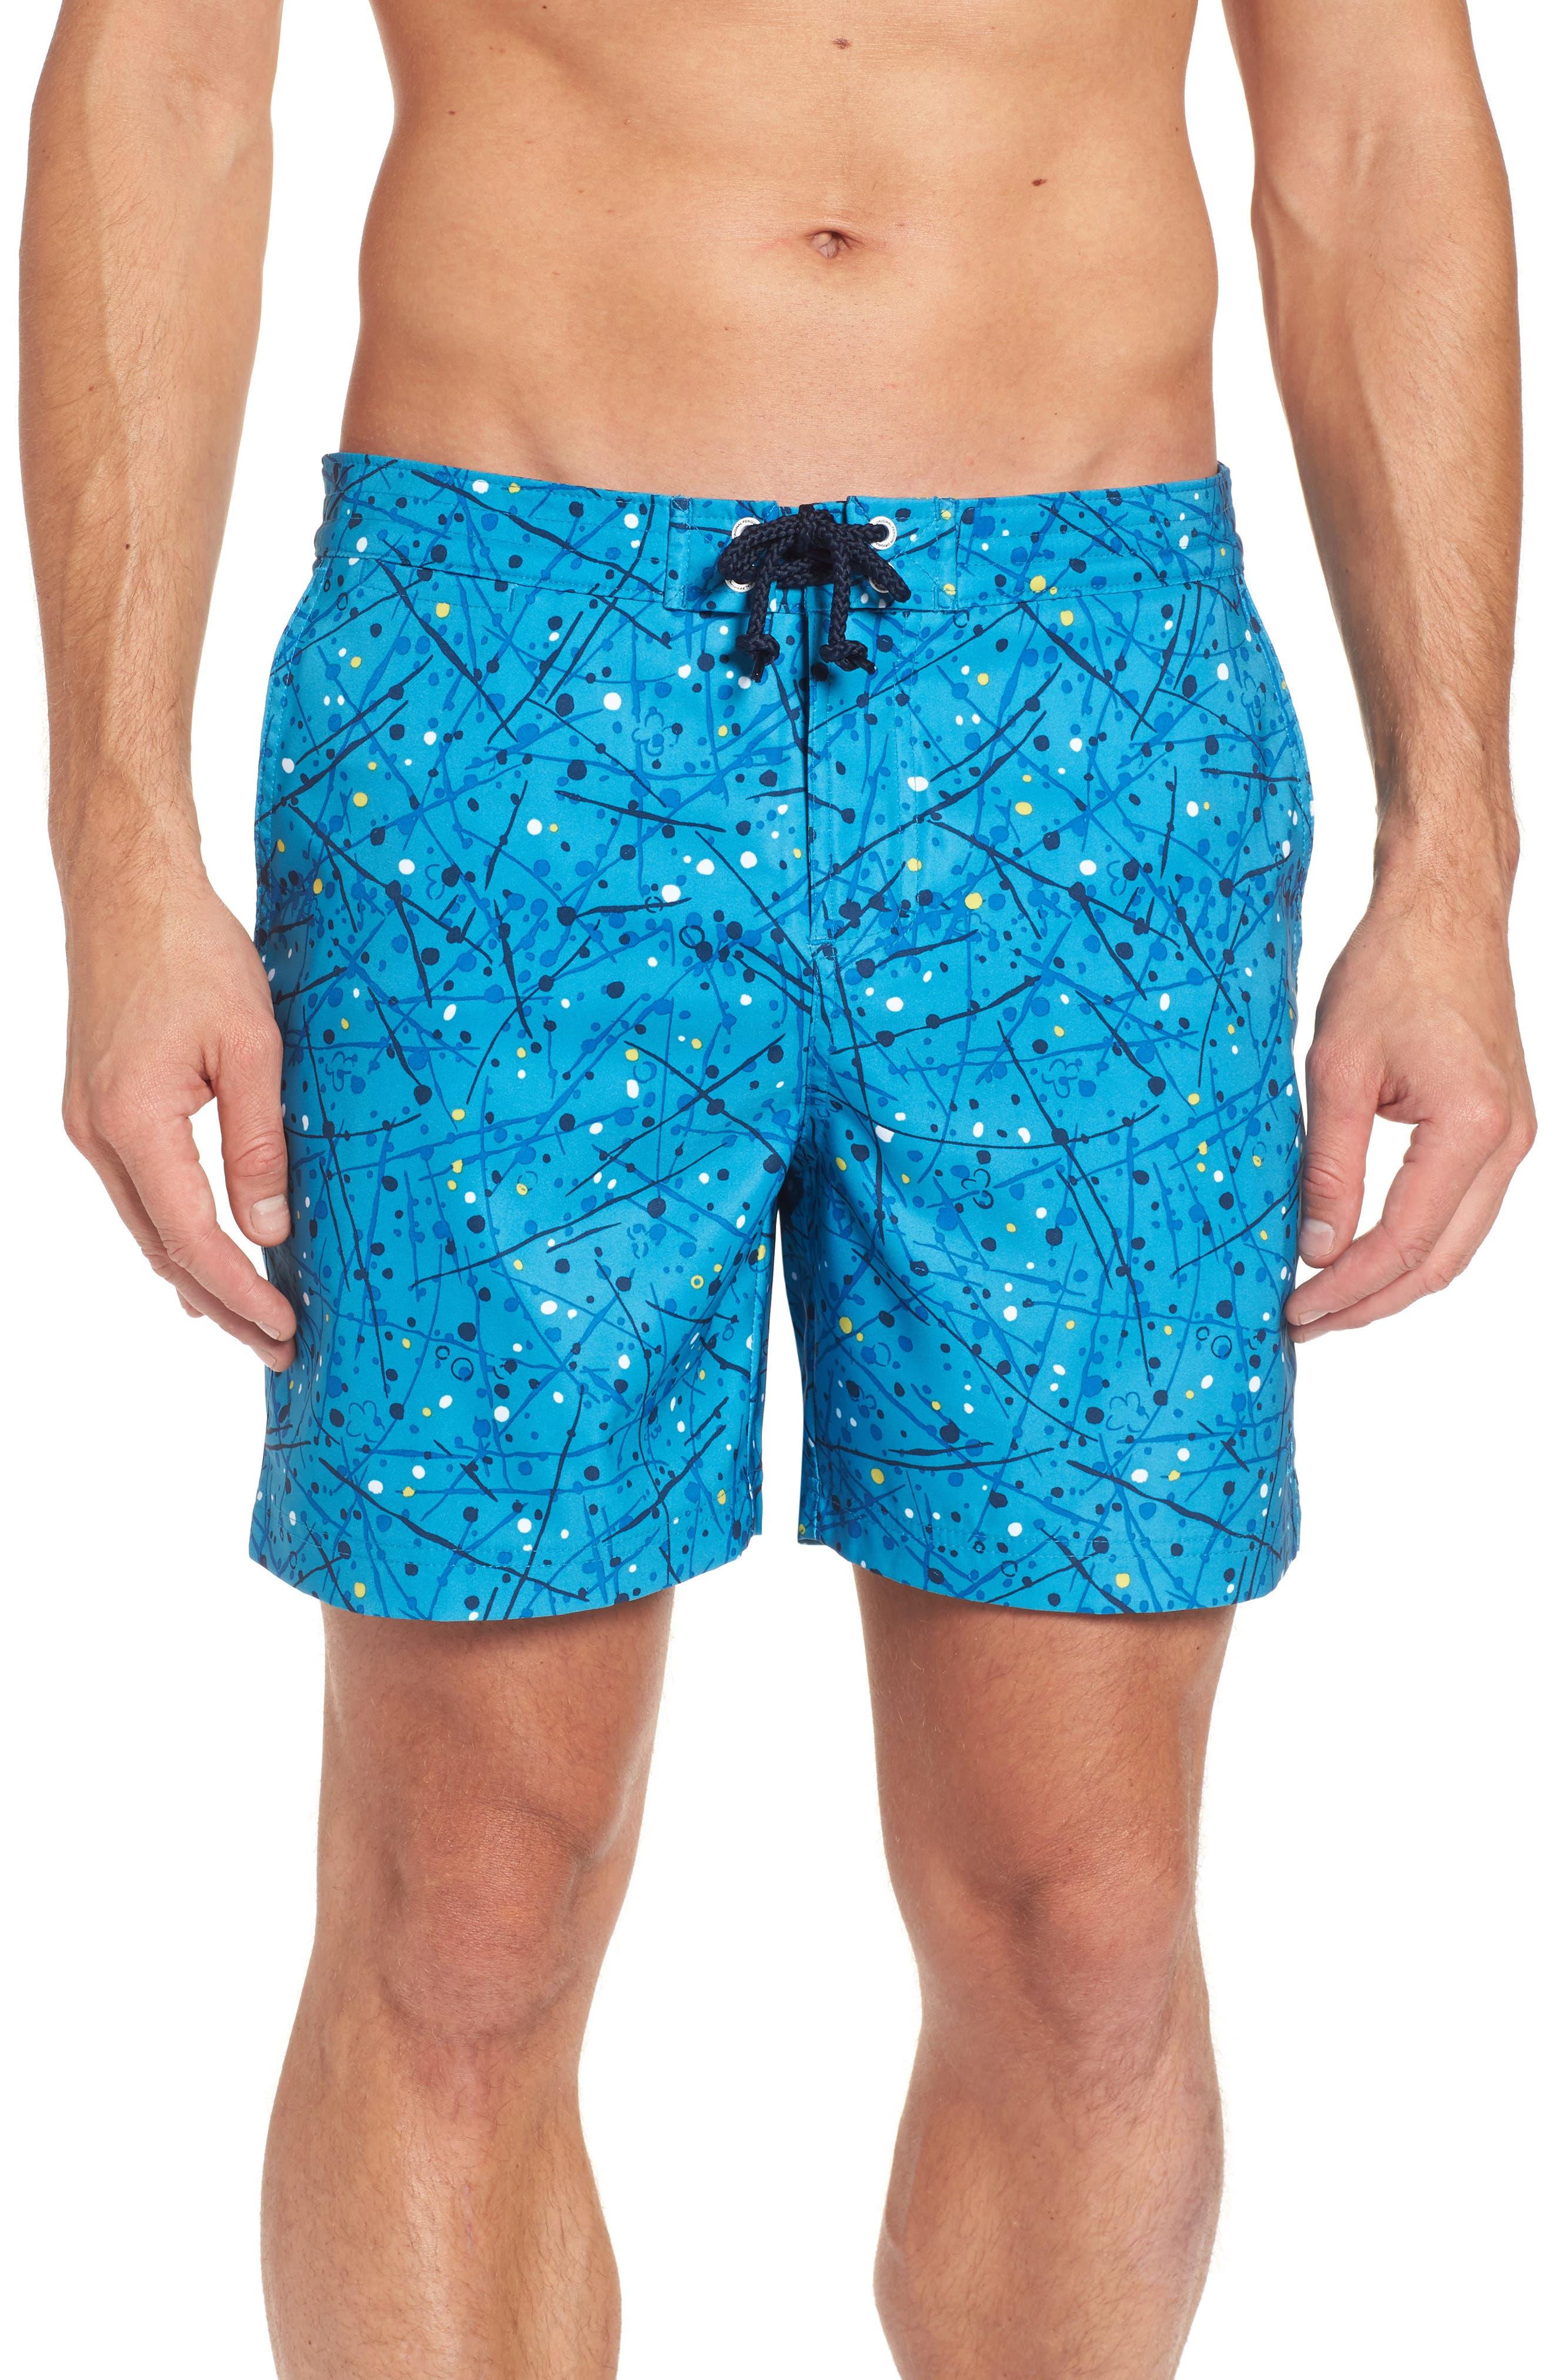 Splatter Paint Swim Trunks,                         Main,                         color, Snorkel Blue